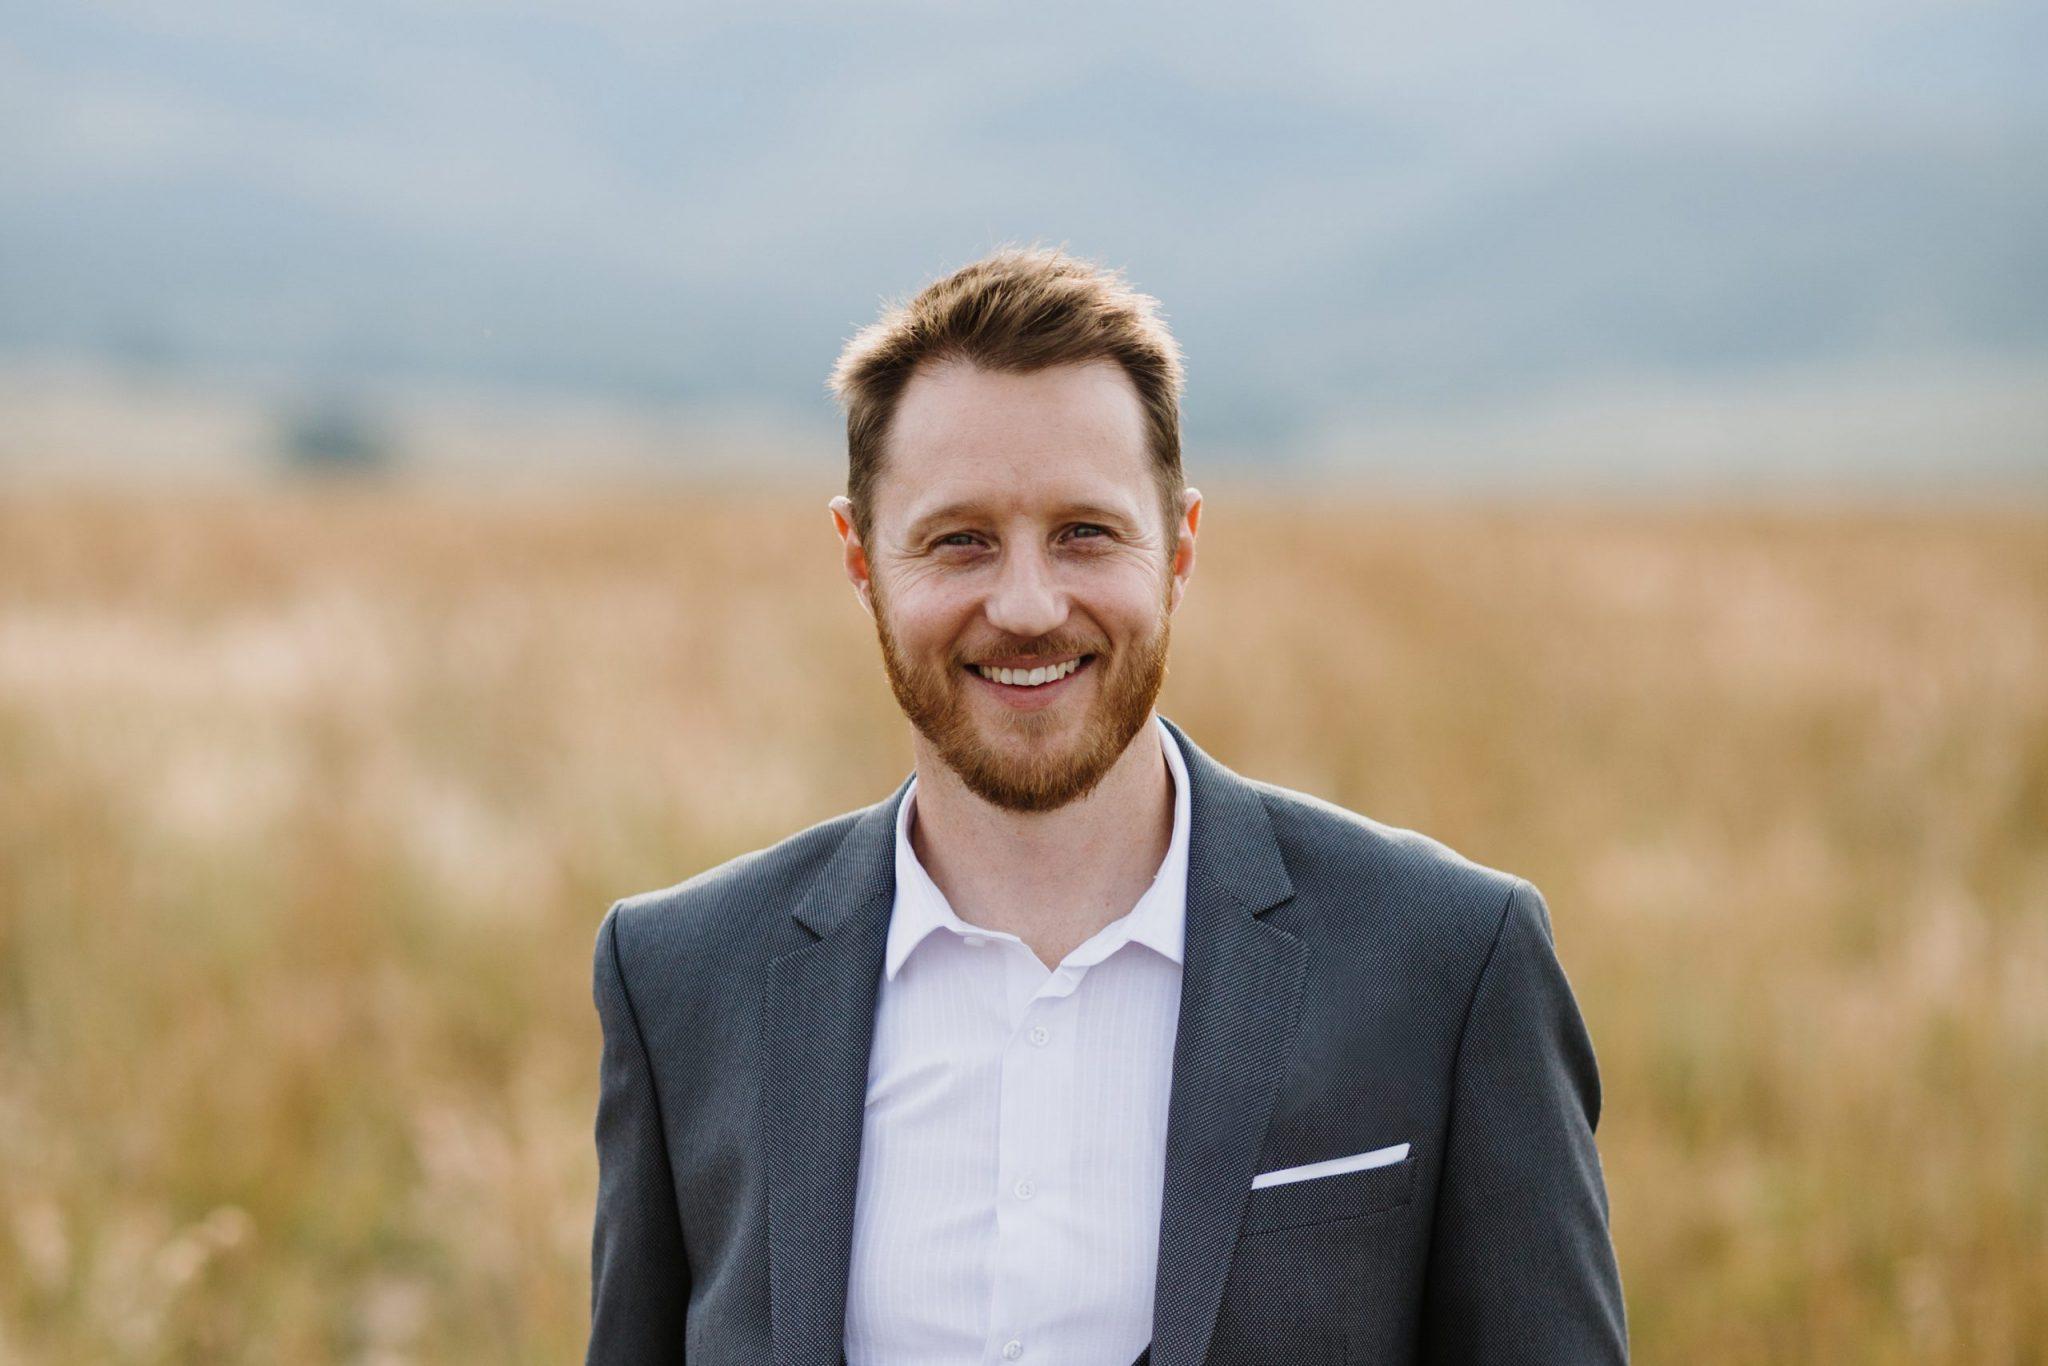 Graham Hartlett, Sales - West U.S. & Canada